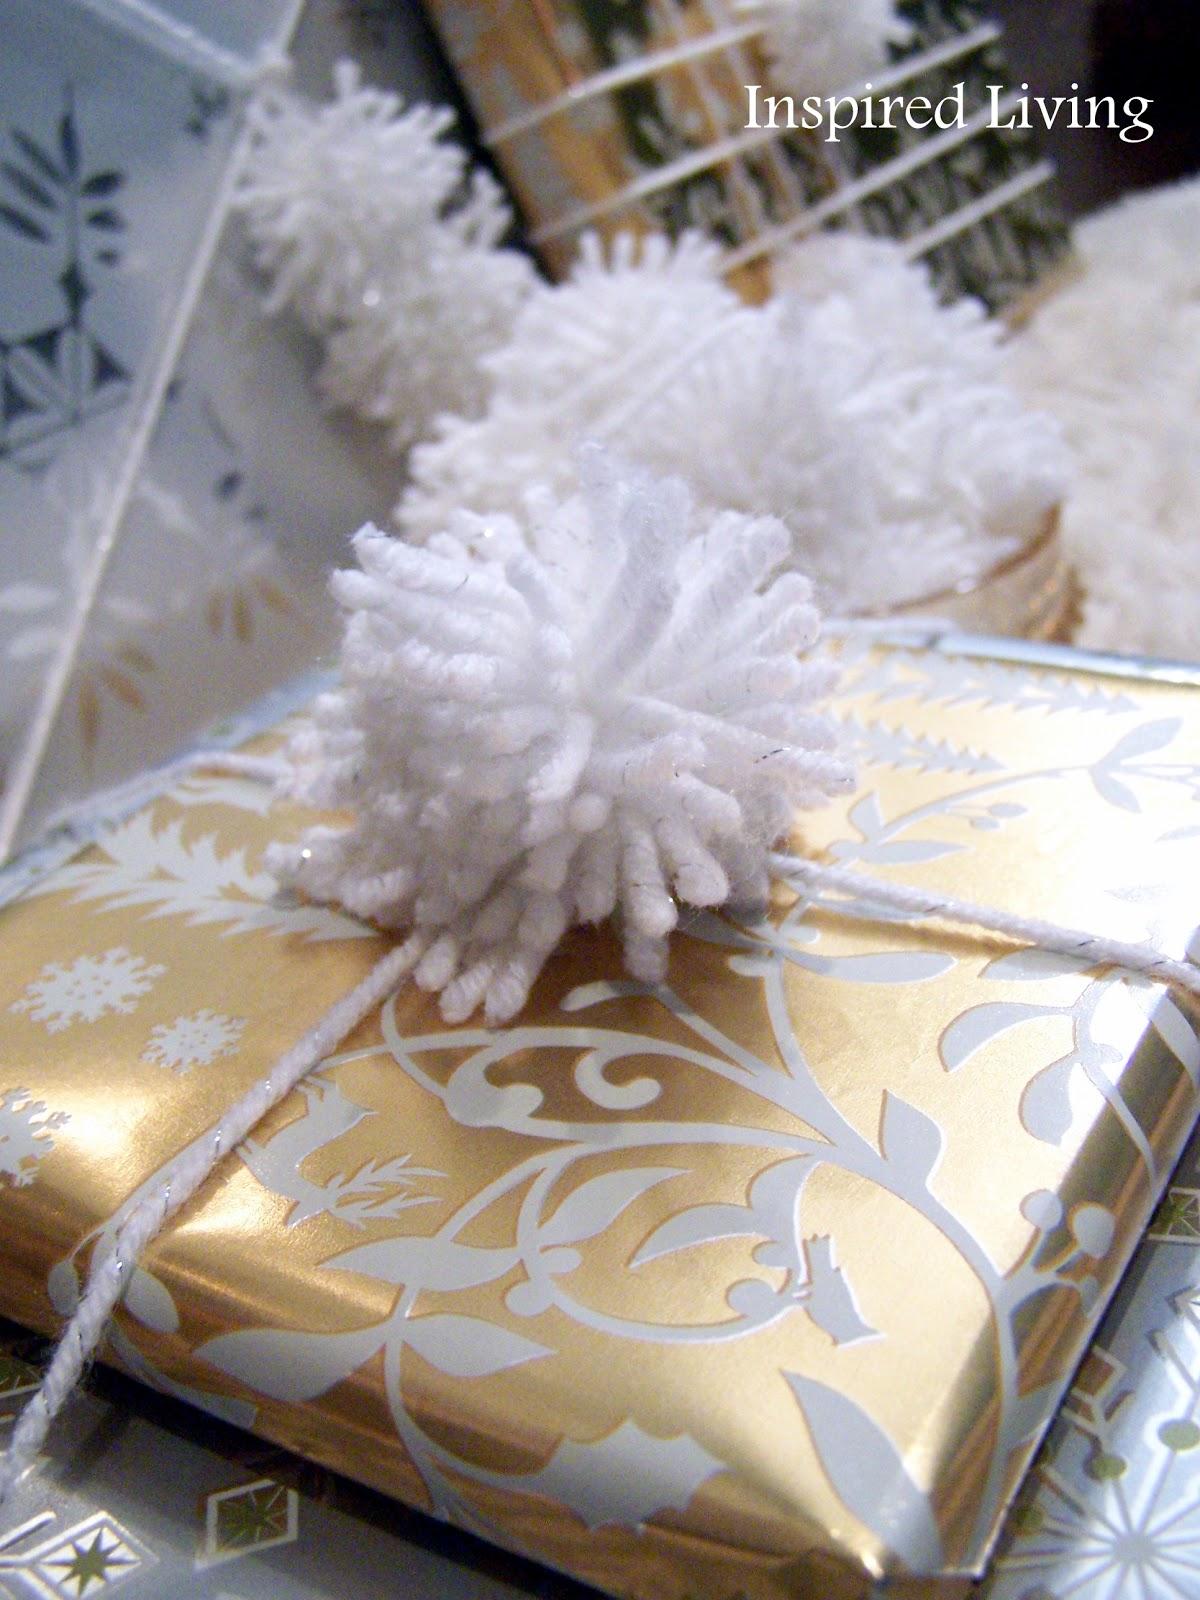 http://2.bp.blogspot.com/-FTqX46jF1EU/UNJTQxaqhuI/AAAAAAAABxk/tHdFHbiC9a8/s1600/103_4093-001.JPG